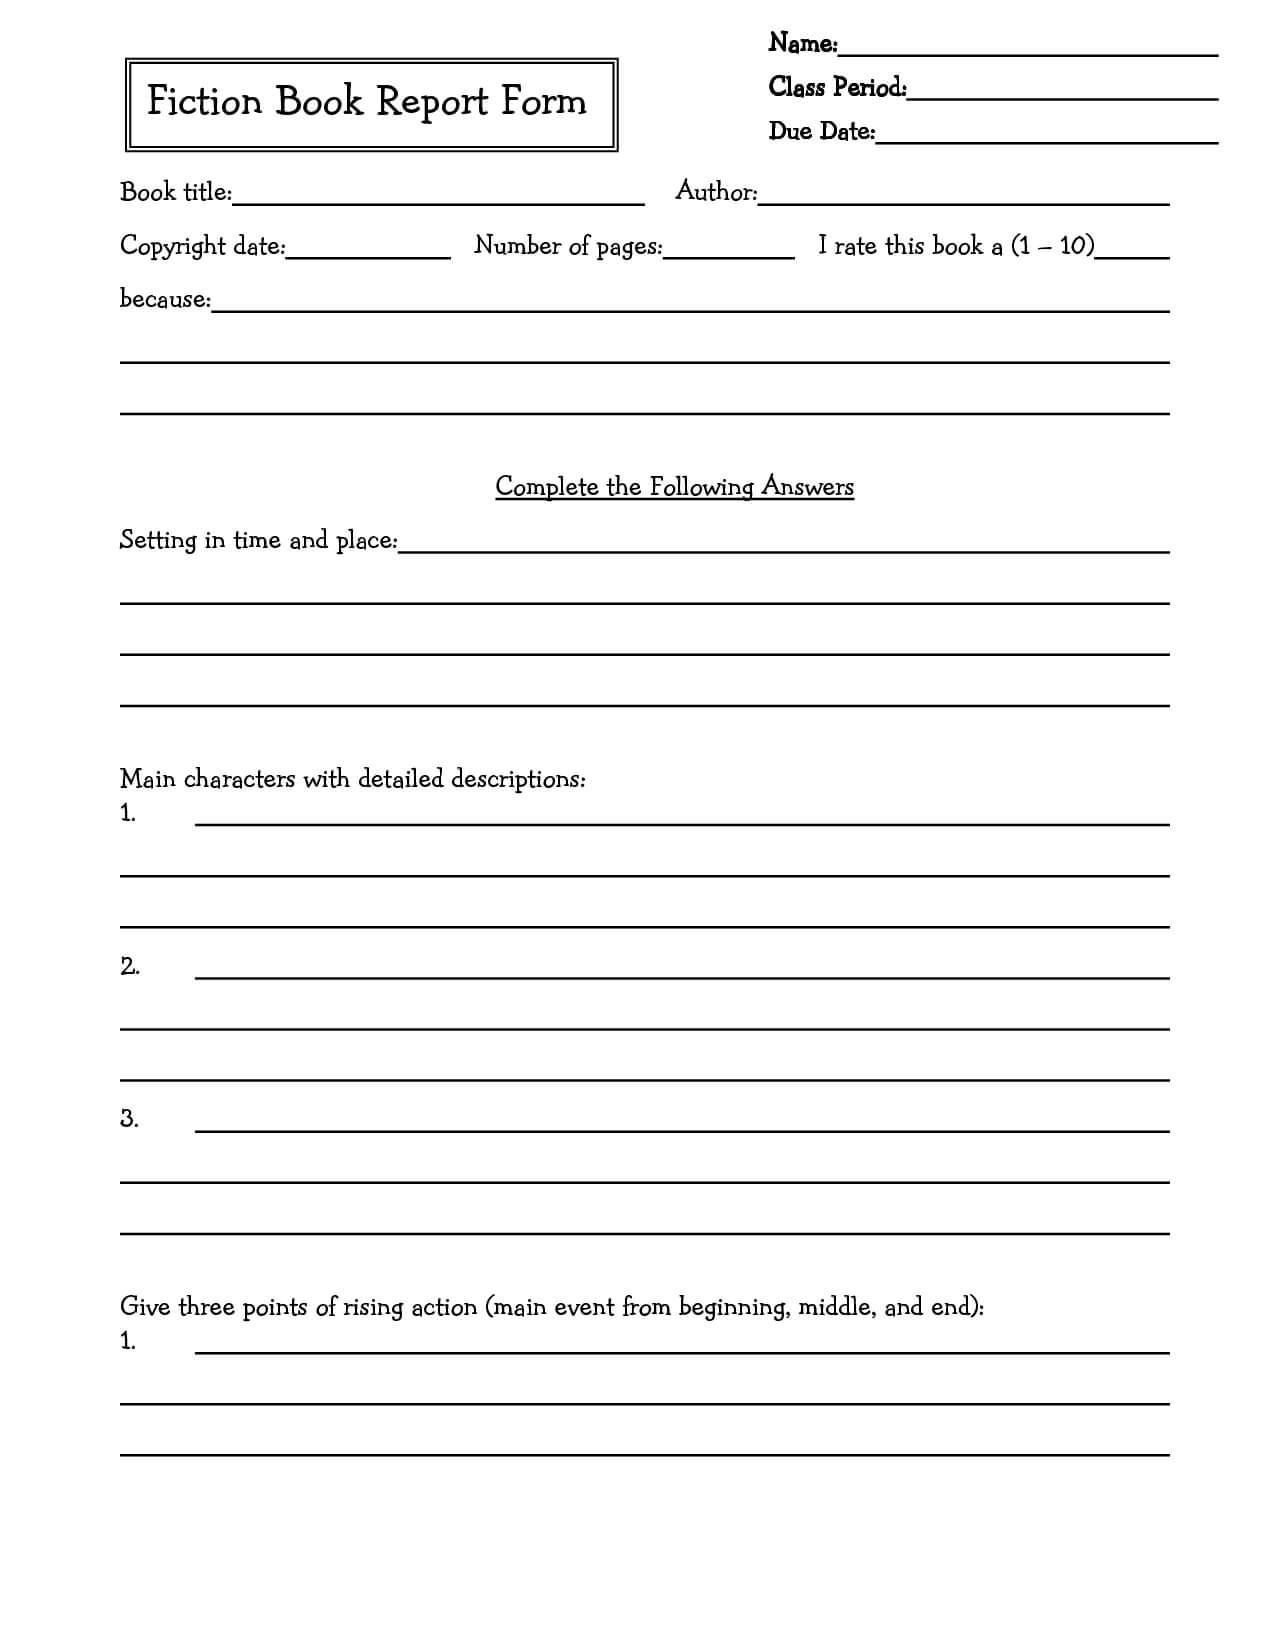 Middle School Book Report Brochure. 6Th Grade | 7Th Grade Inside Book Report Template Middle School